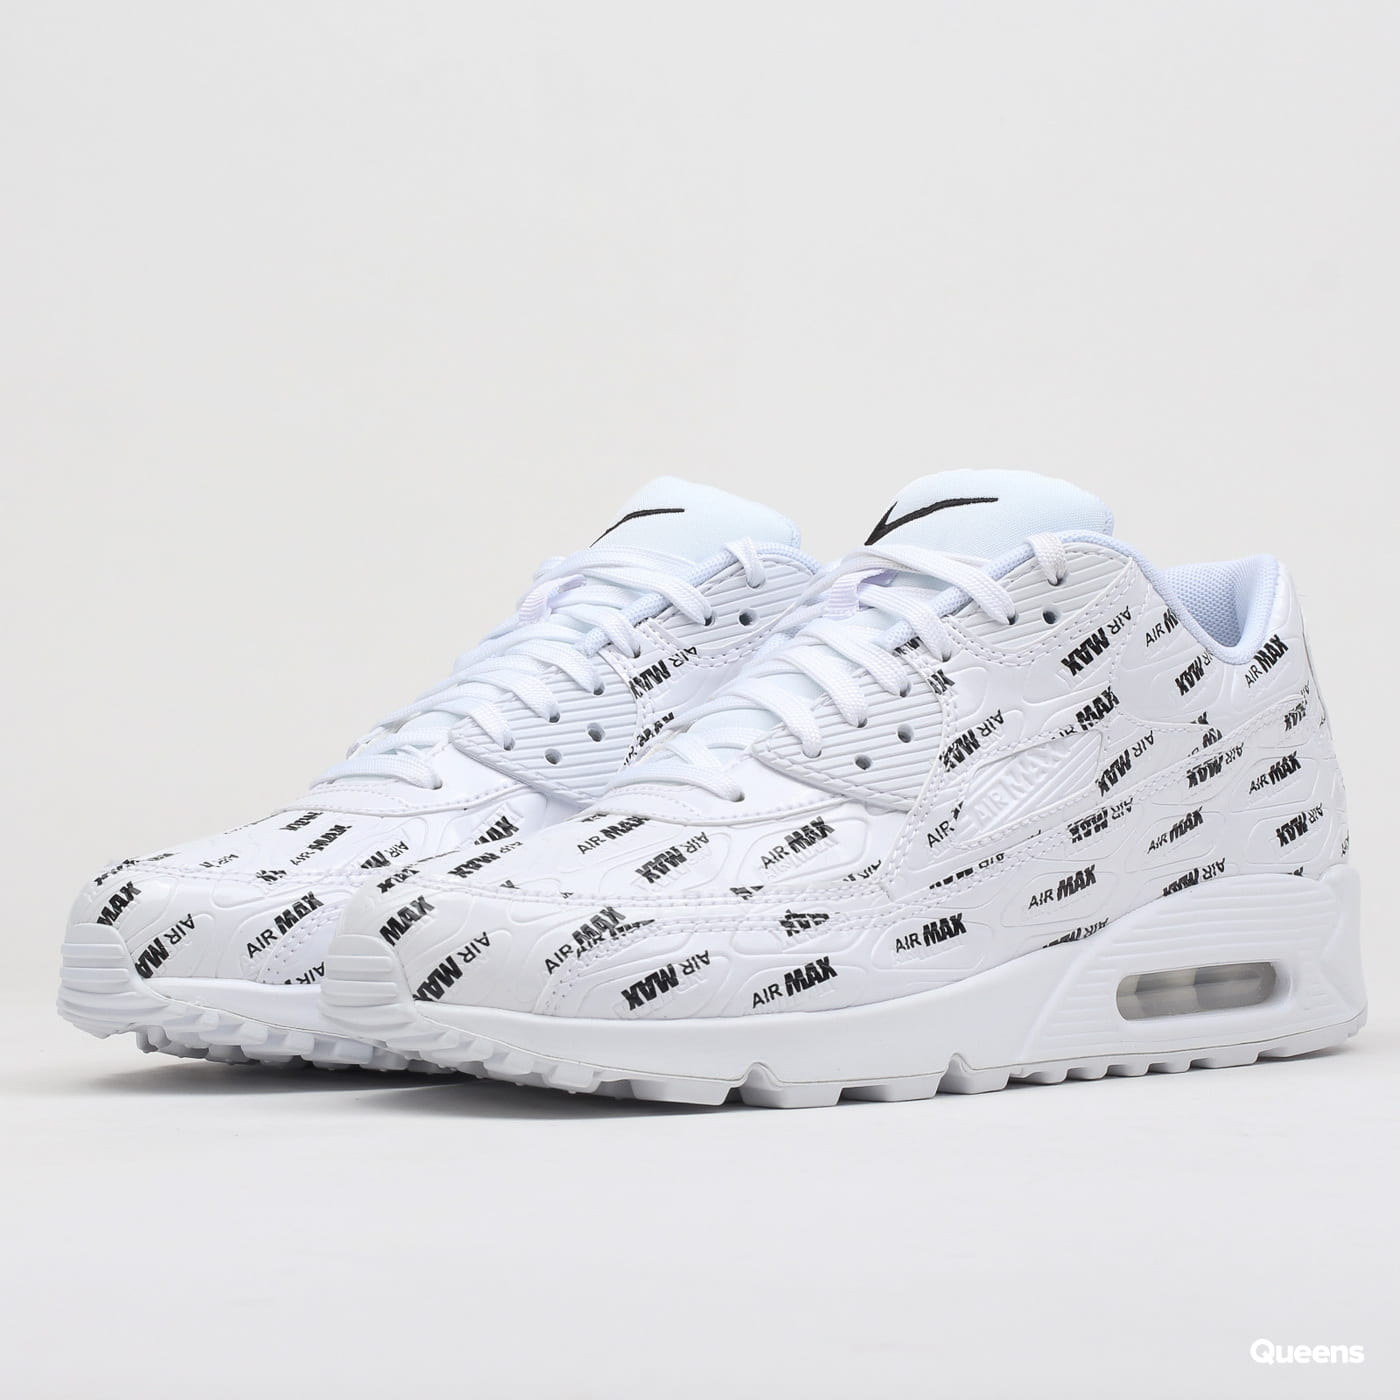 free shipping d8f62 247df Sneakers Nike Air Max 90 Premium (700155-103)– Queens 💚